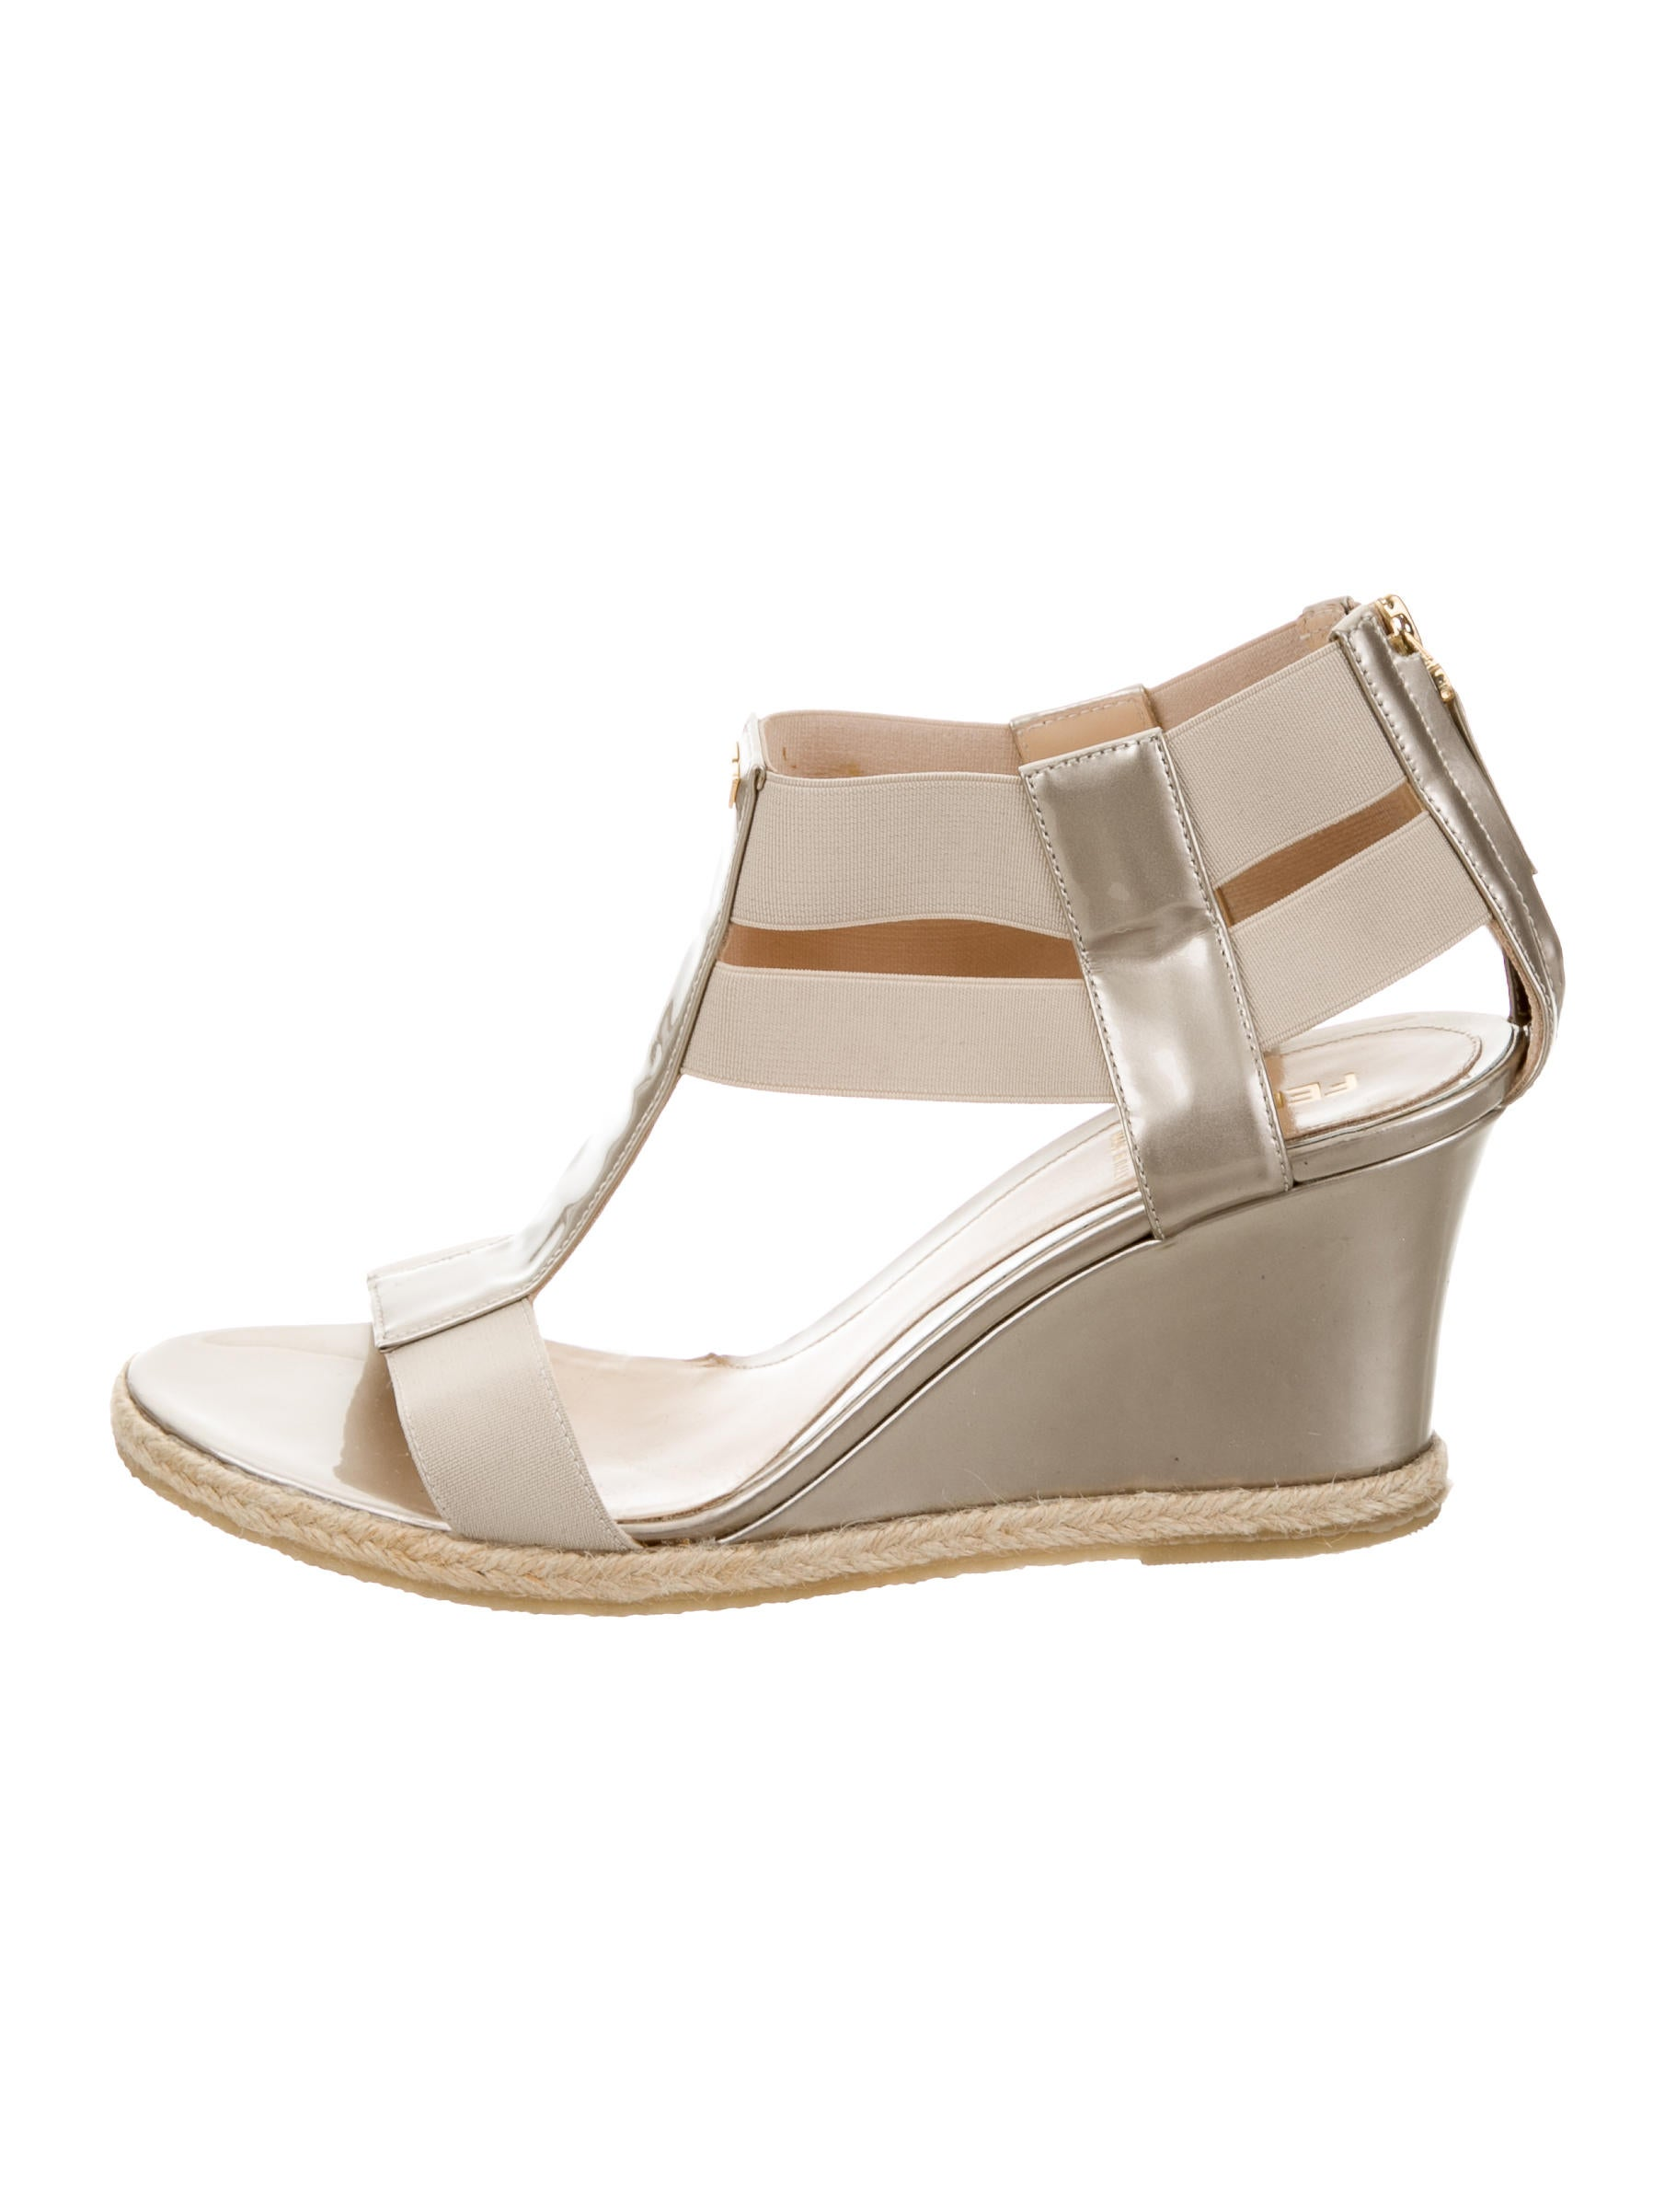 fendi metallic wedge sandals shoes fen51337 the realreal